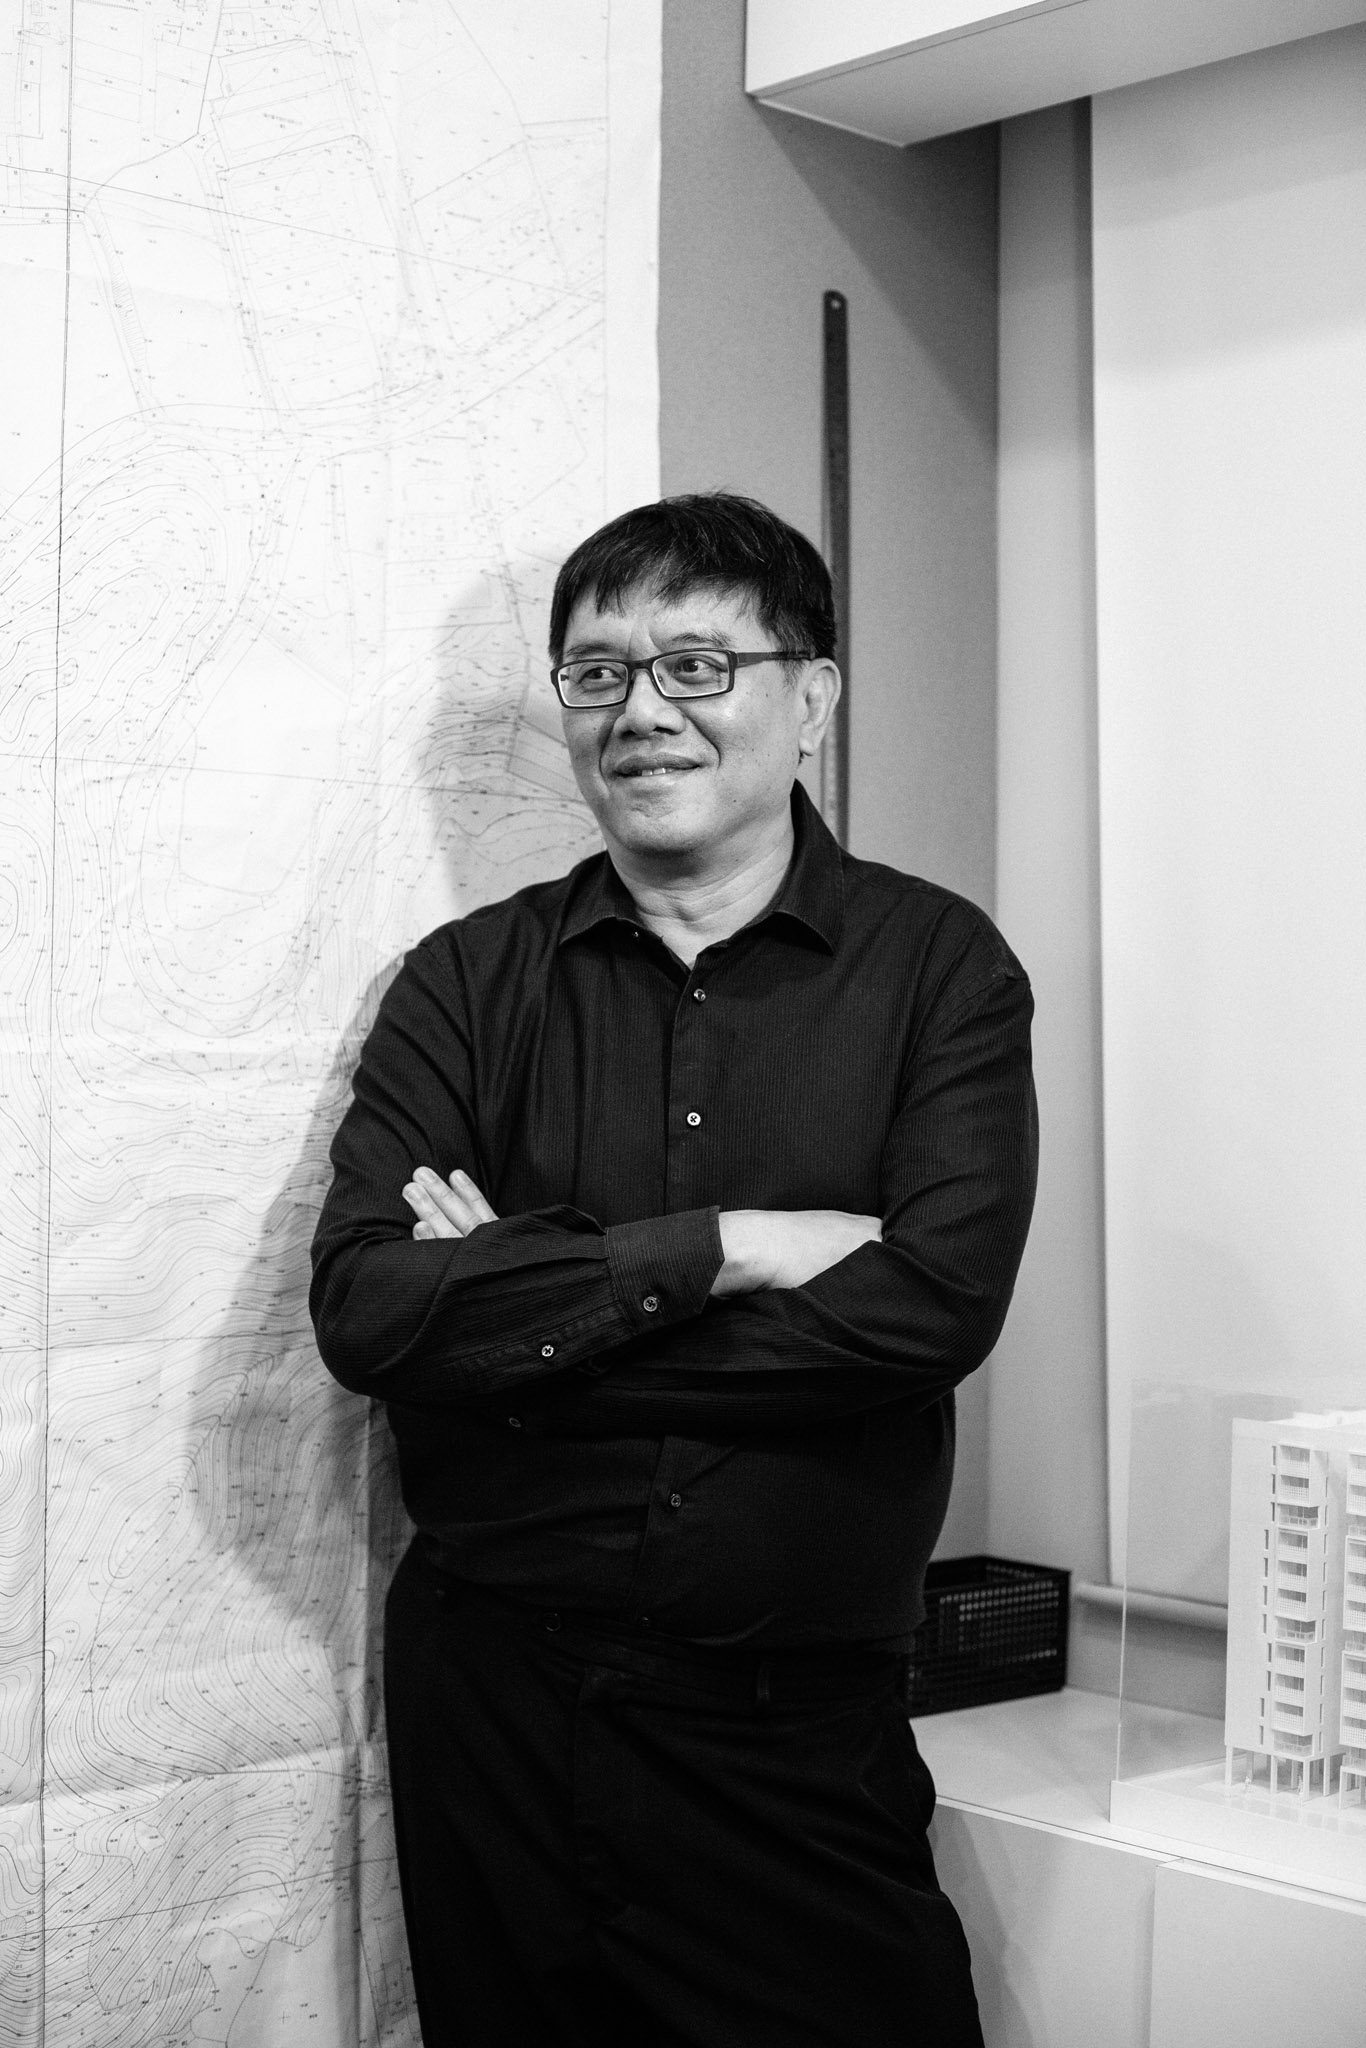 singapore-commercial-editorial-photographer-architecture-president-design-award-singapore-architect-magazine-zakaria-zainal-26.jpg